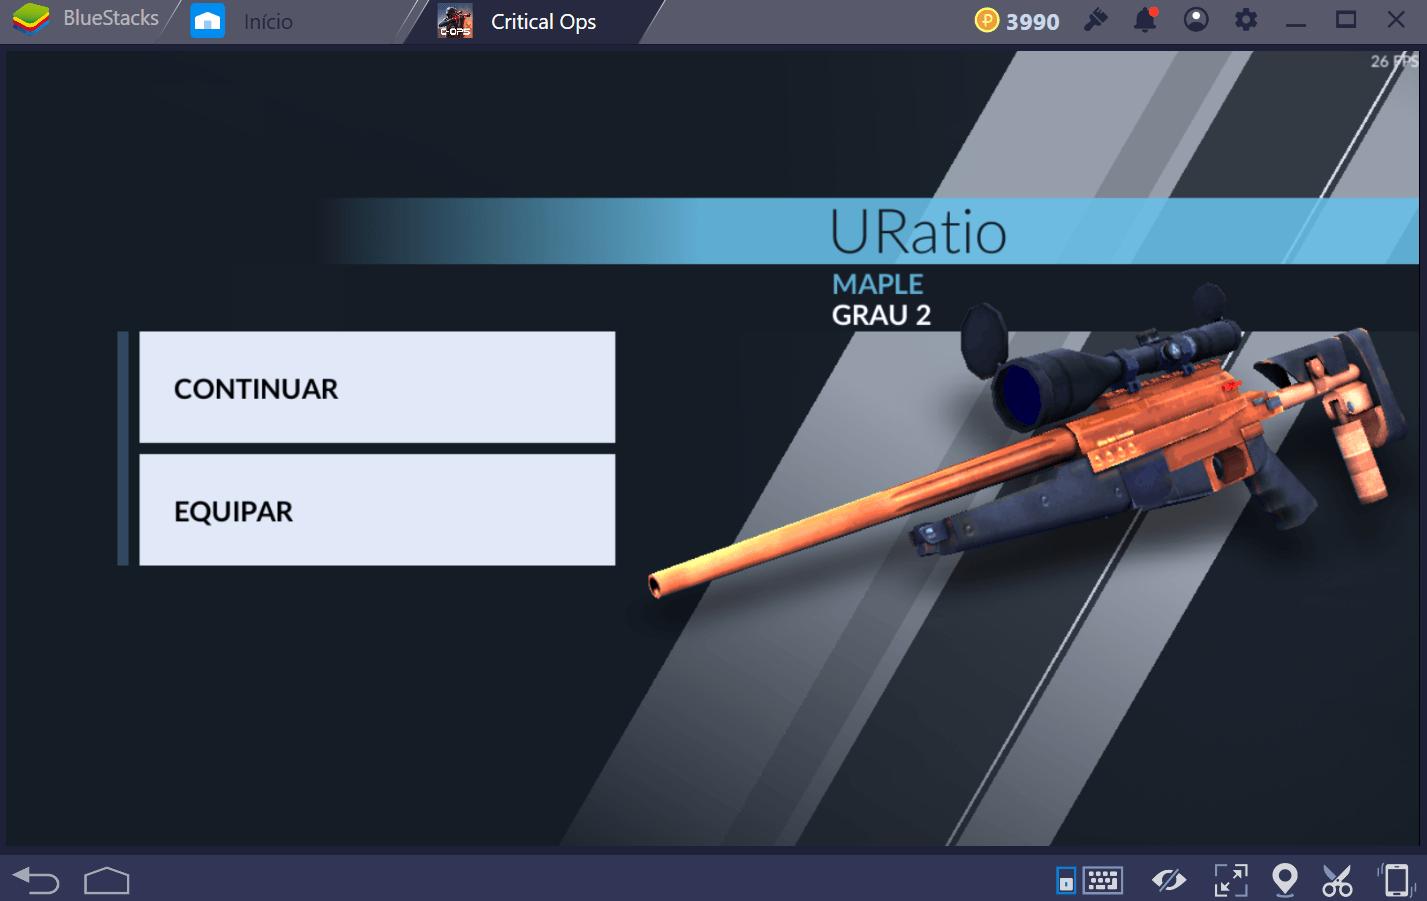 Guia para sniper em Critical Ops